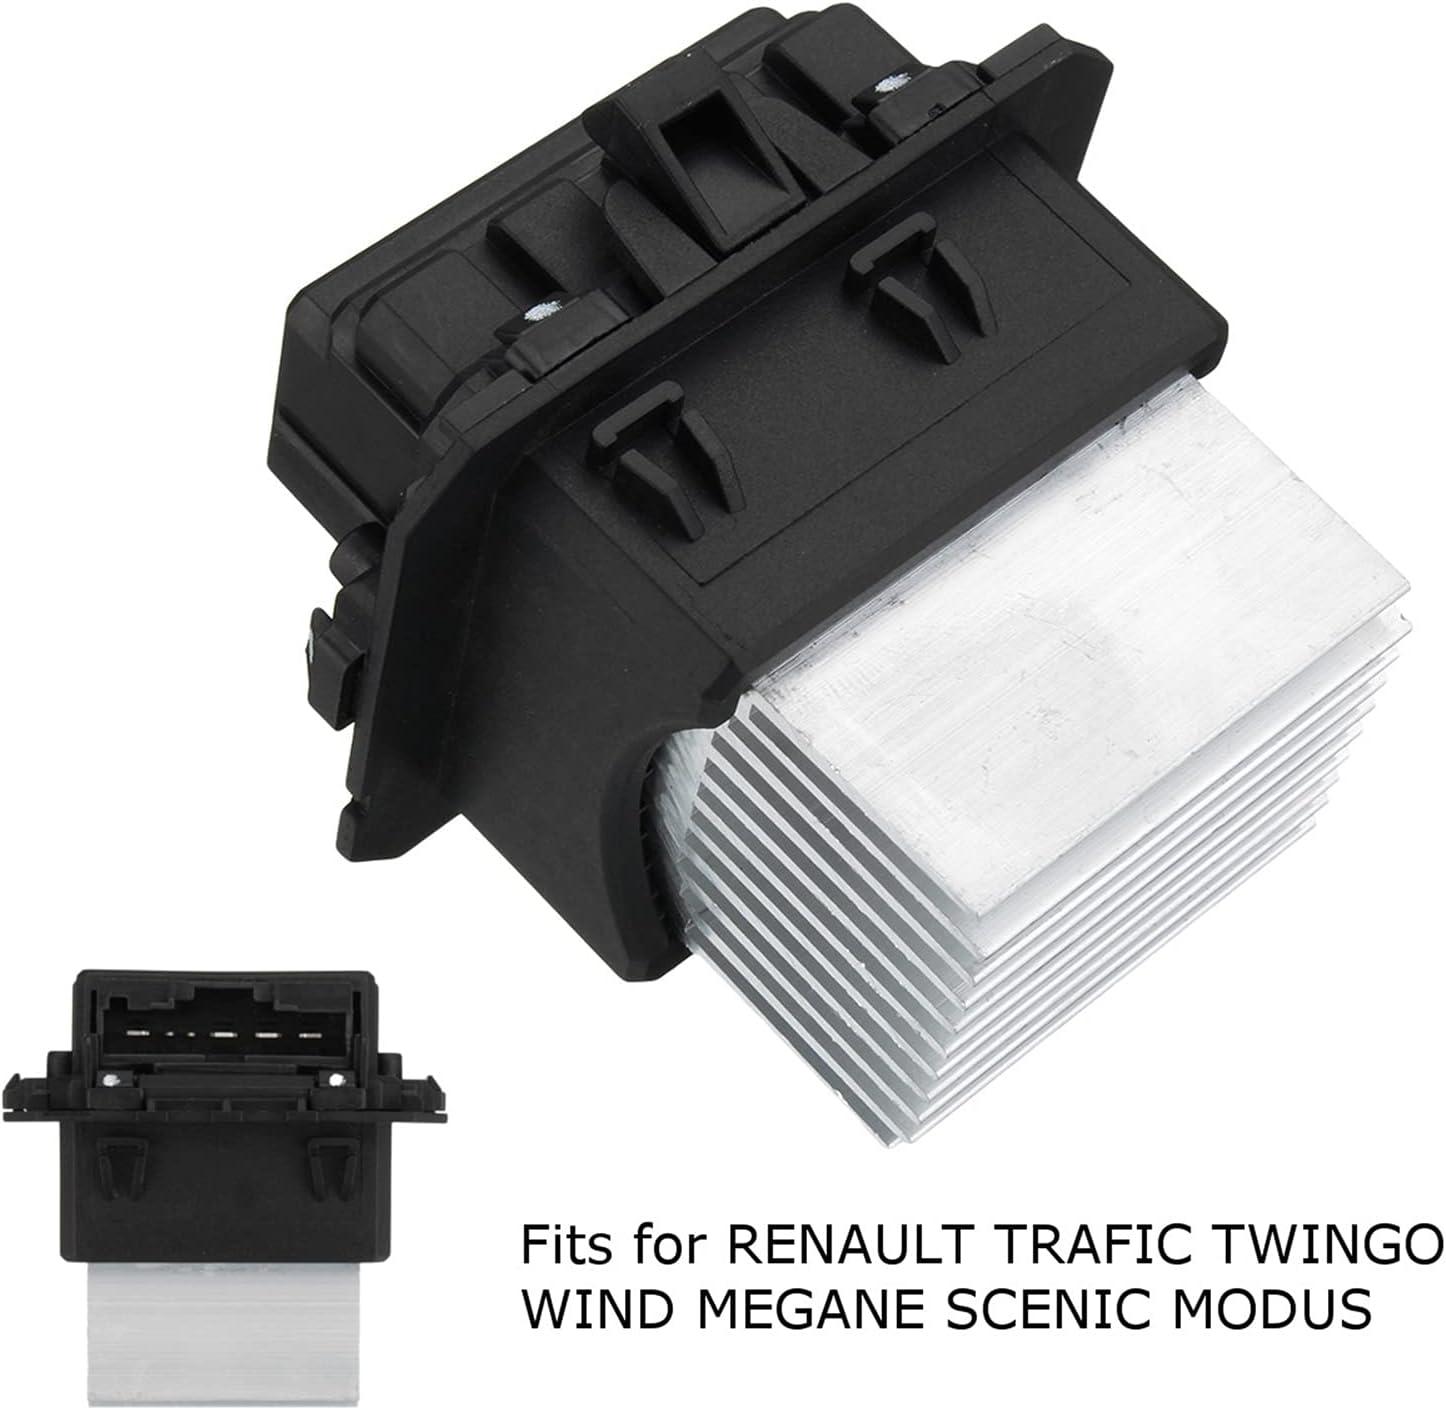 huhu Calentador Blower Motor Resistor Fit para Renault Wind Scenic Modus Twingo Megane Trafic 2002-2014 7701209850 6441.AF 6441.A